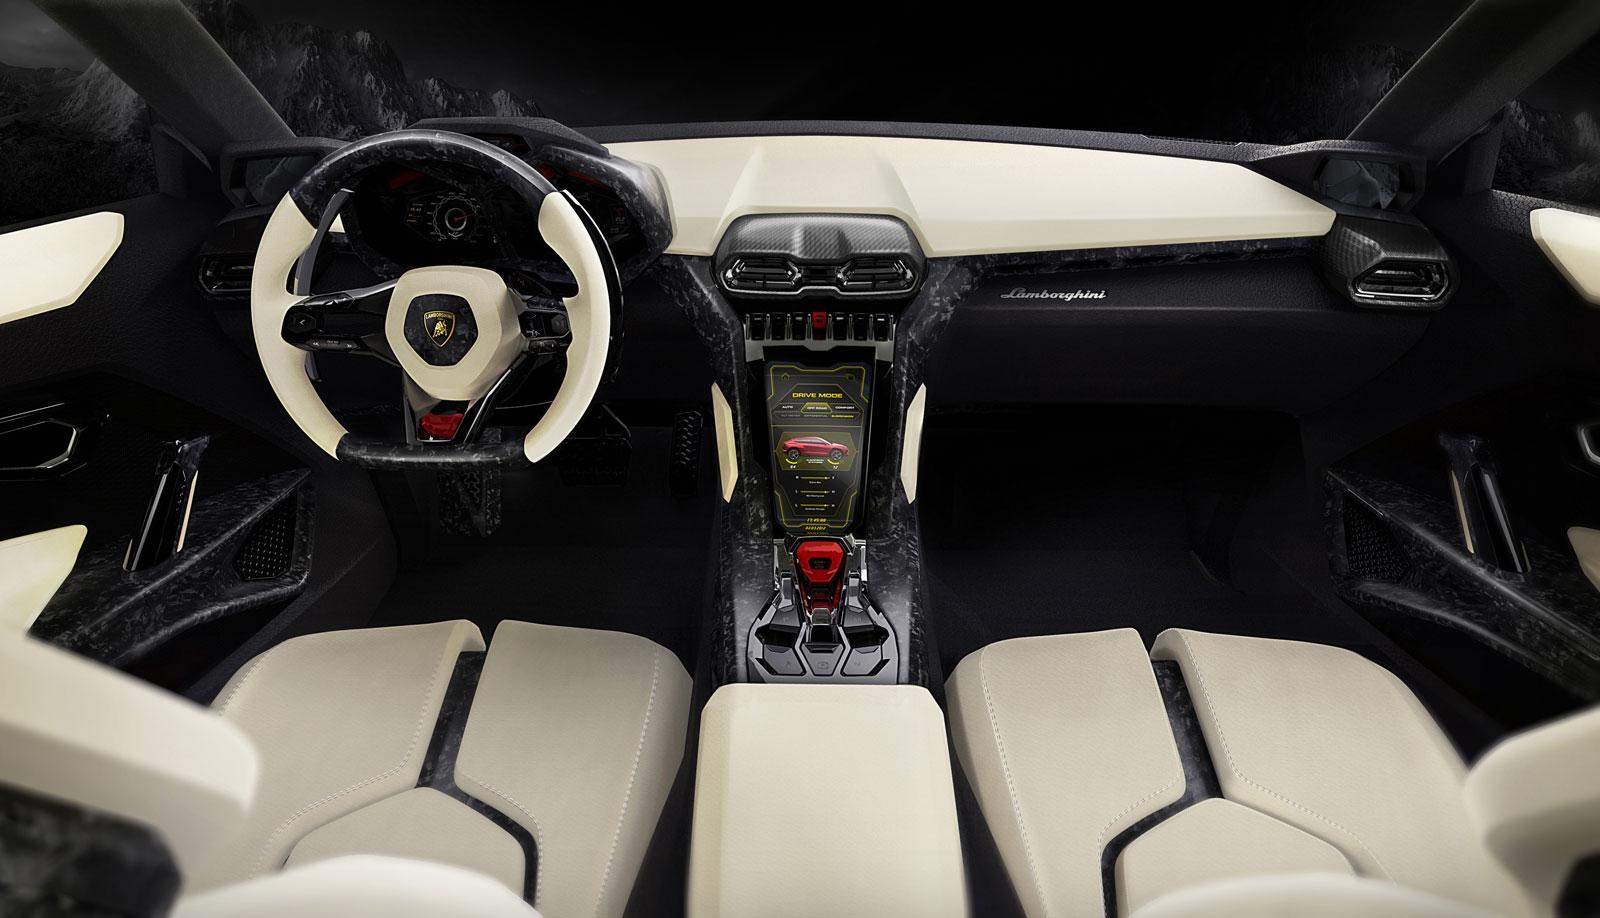 lamborghini veneno roadster msrp with 24251 on Blue Motocross Gear furthermore Lamborghini Aventador as well Lamborghini Aventador Lp700 4 Model further Fastest Stock Motorcycle For 2015 as well 2017 Lamborghini Huracan Spyder Lp580 2.